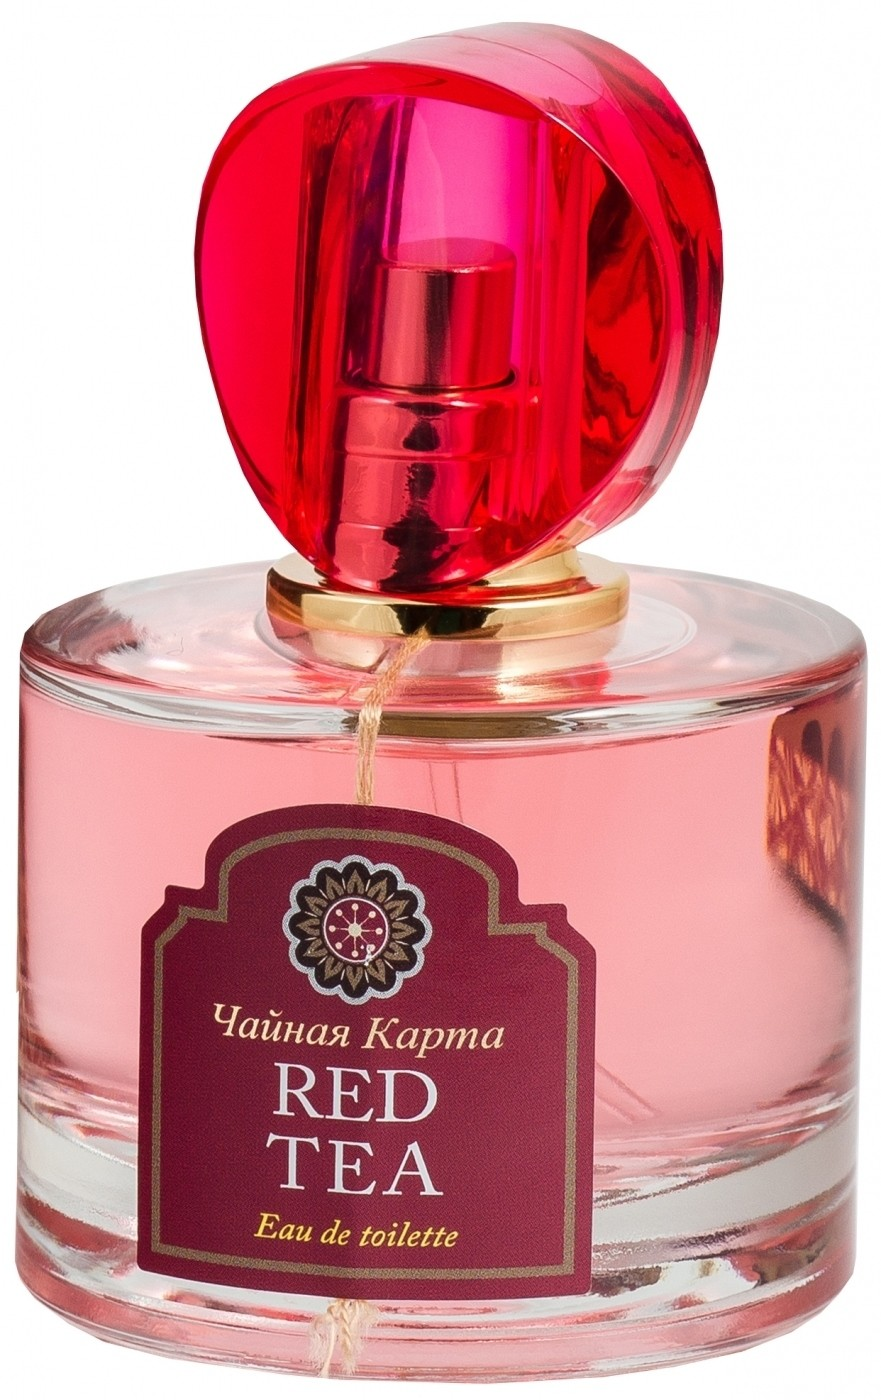 Parli Red Tea аромат для женщин